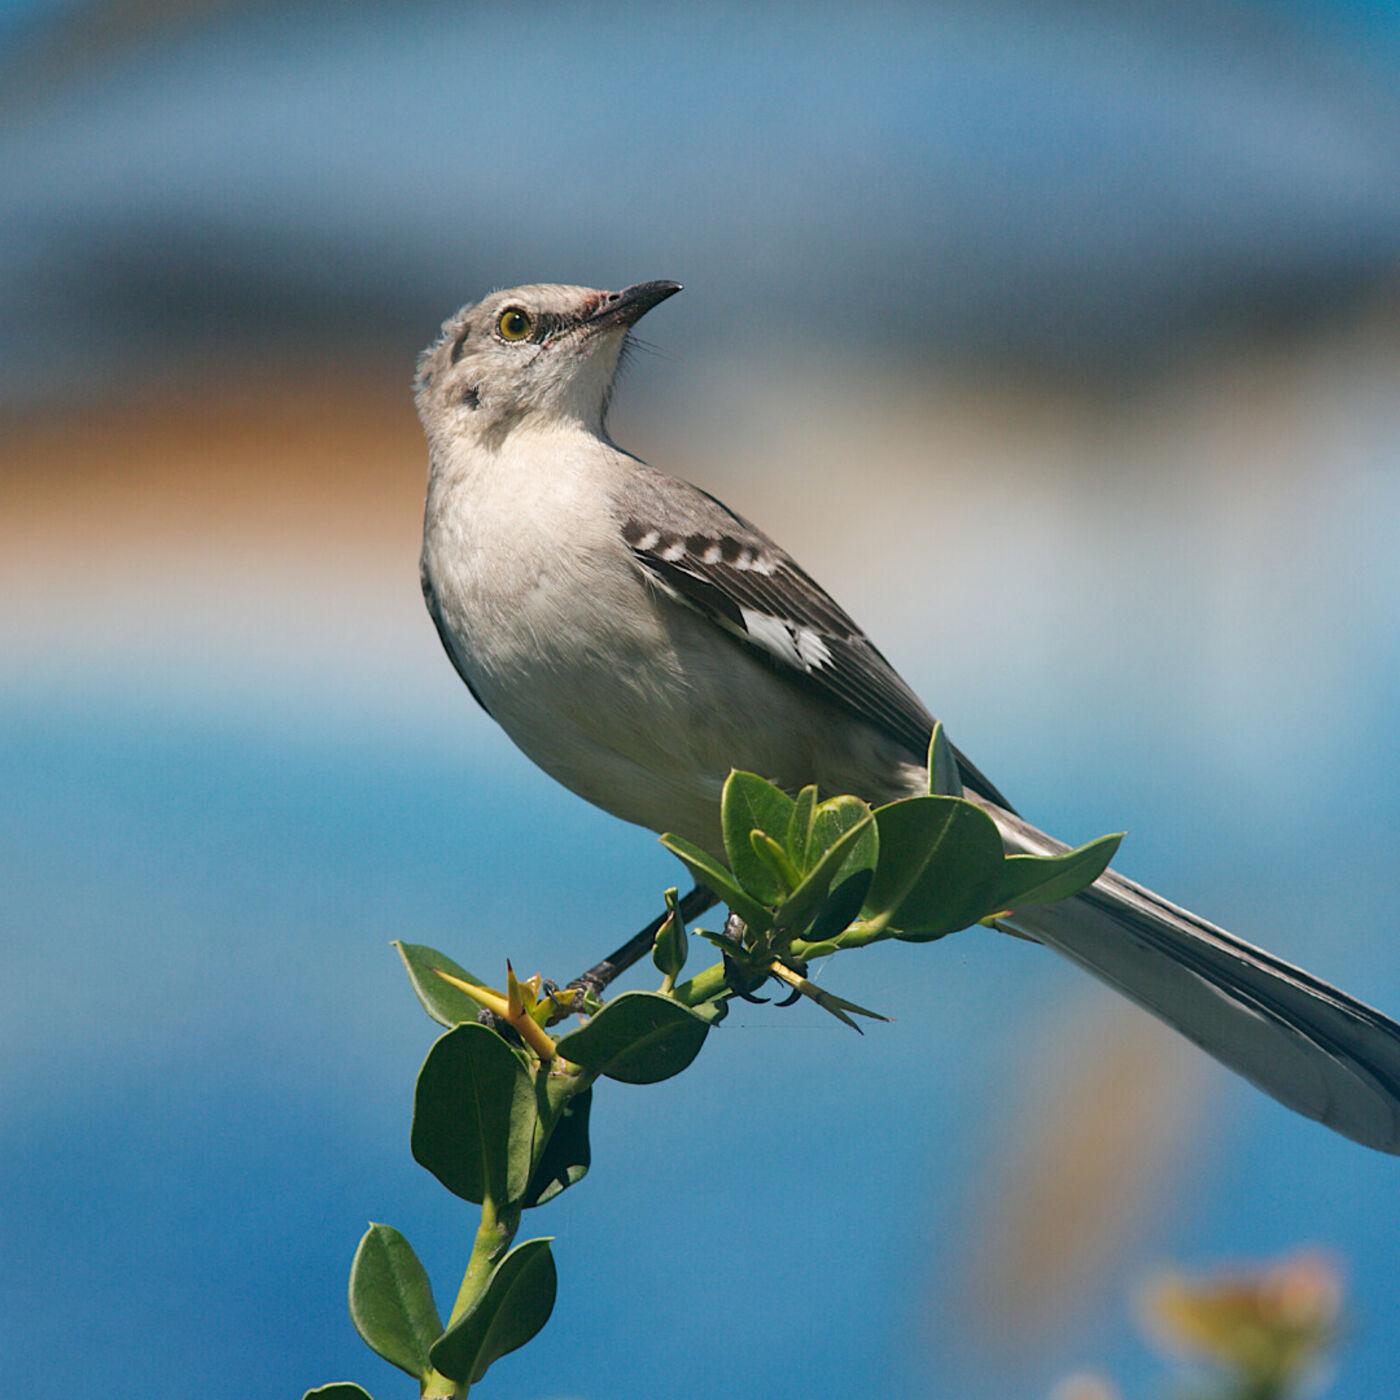 Gardening for Attracting Wild Birds